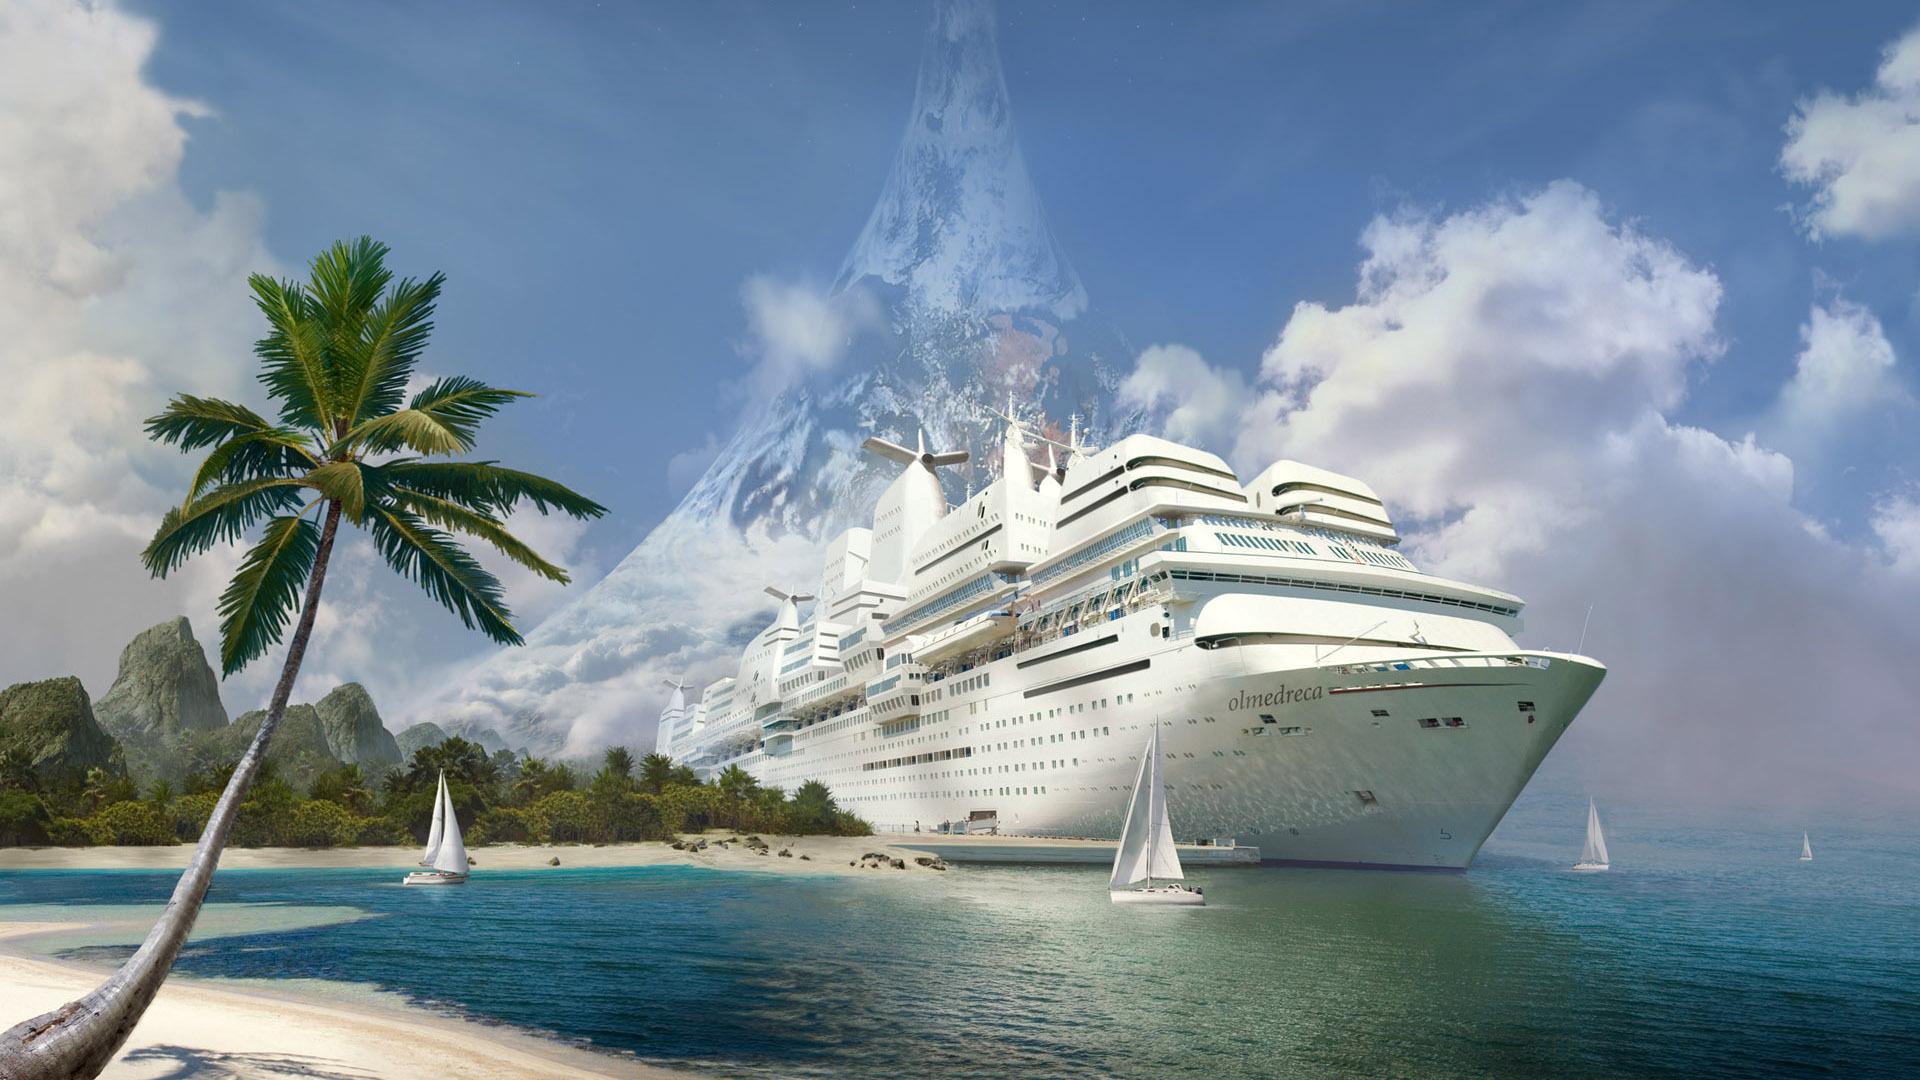 1417522051_olmedreca-cruise-ship-1920x1080-wallpaper-rgbke8